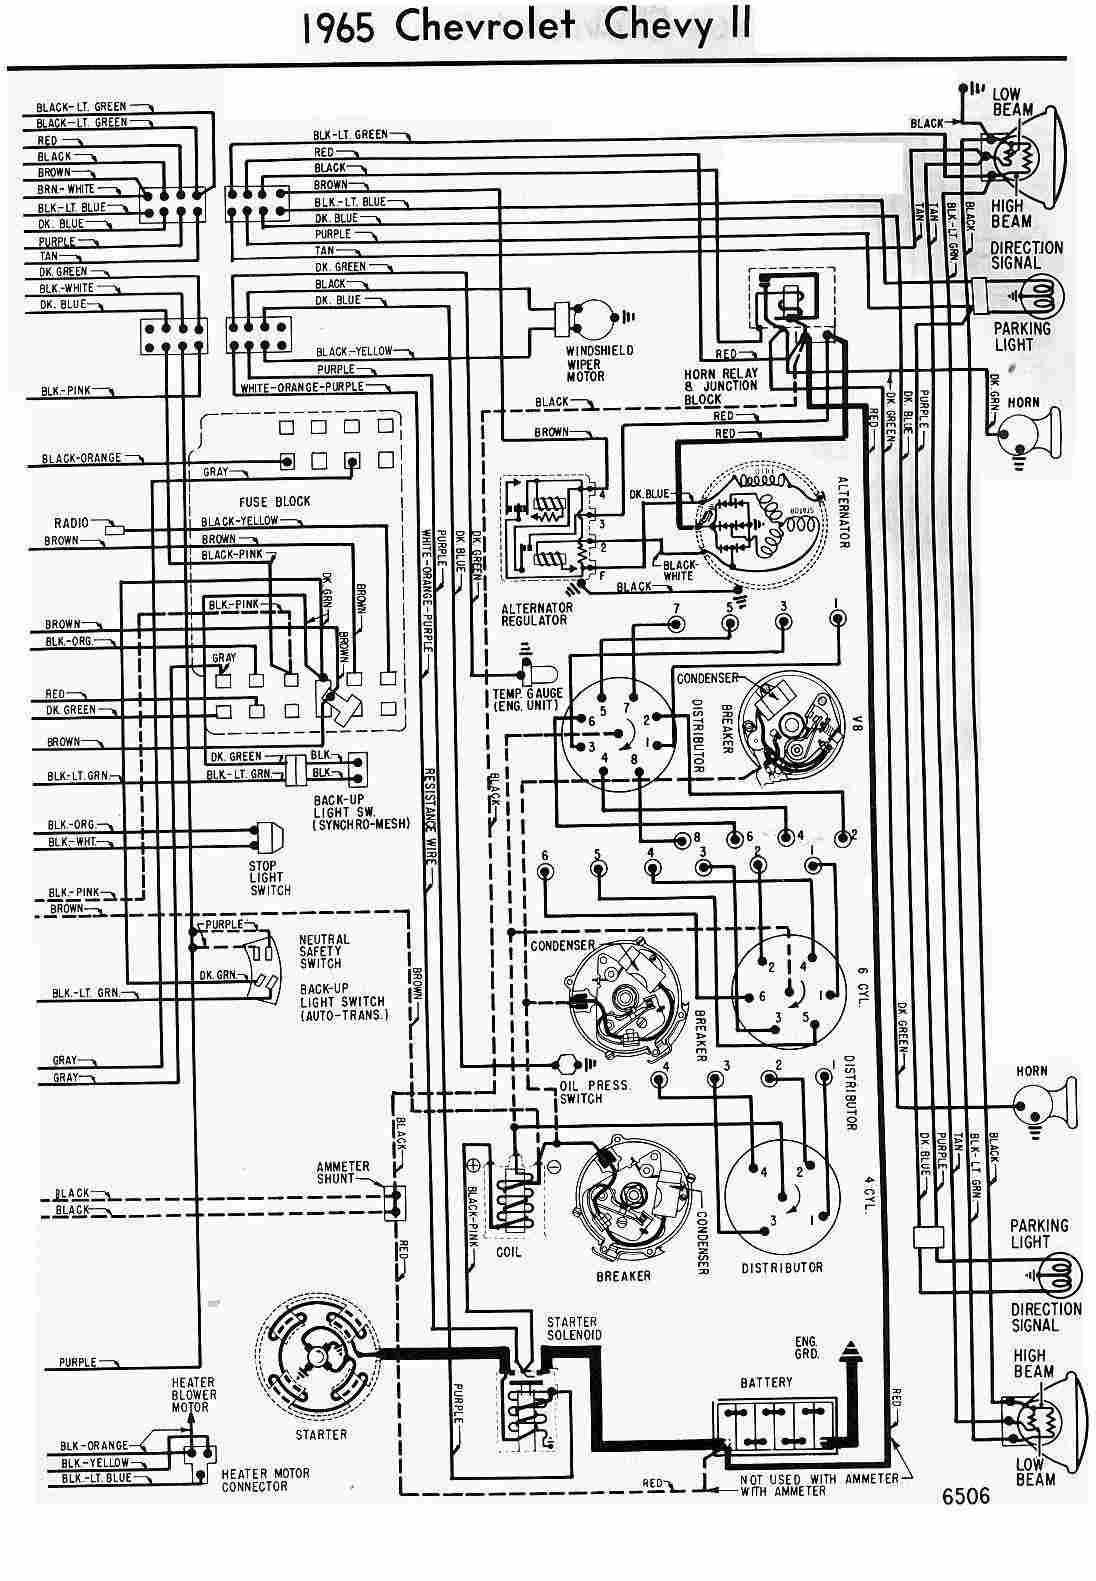 1968 Impala Turn Signal Wiring Diagram Circuit Schema Ford F650 For List Of Schematic U2022 2005